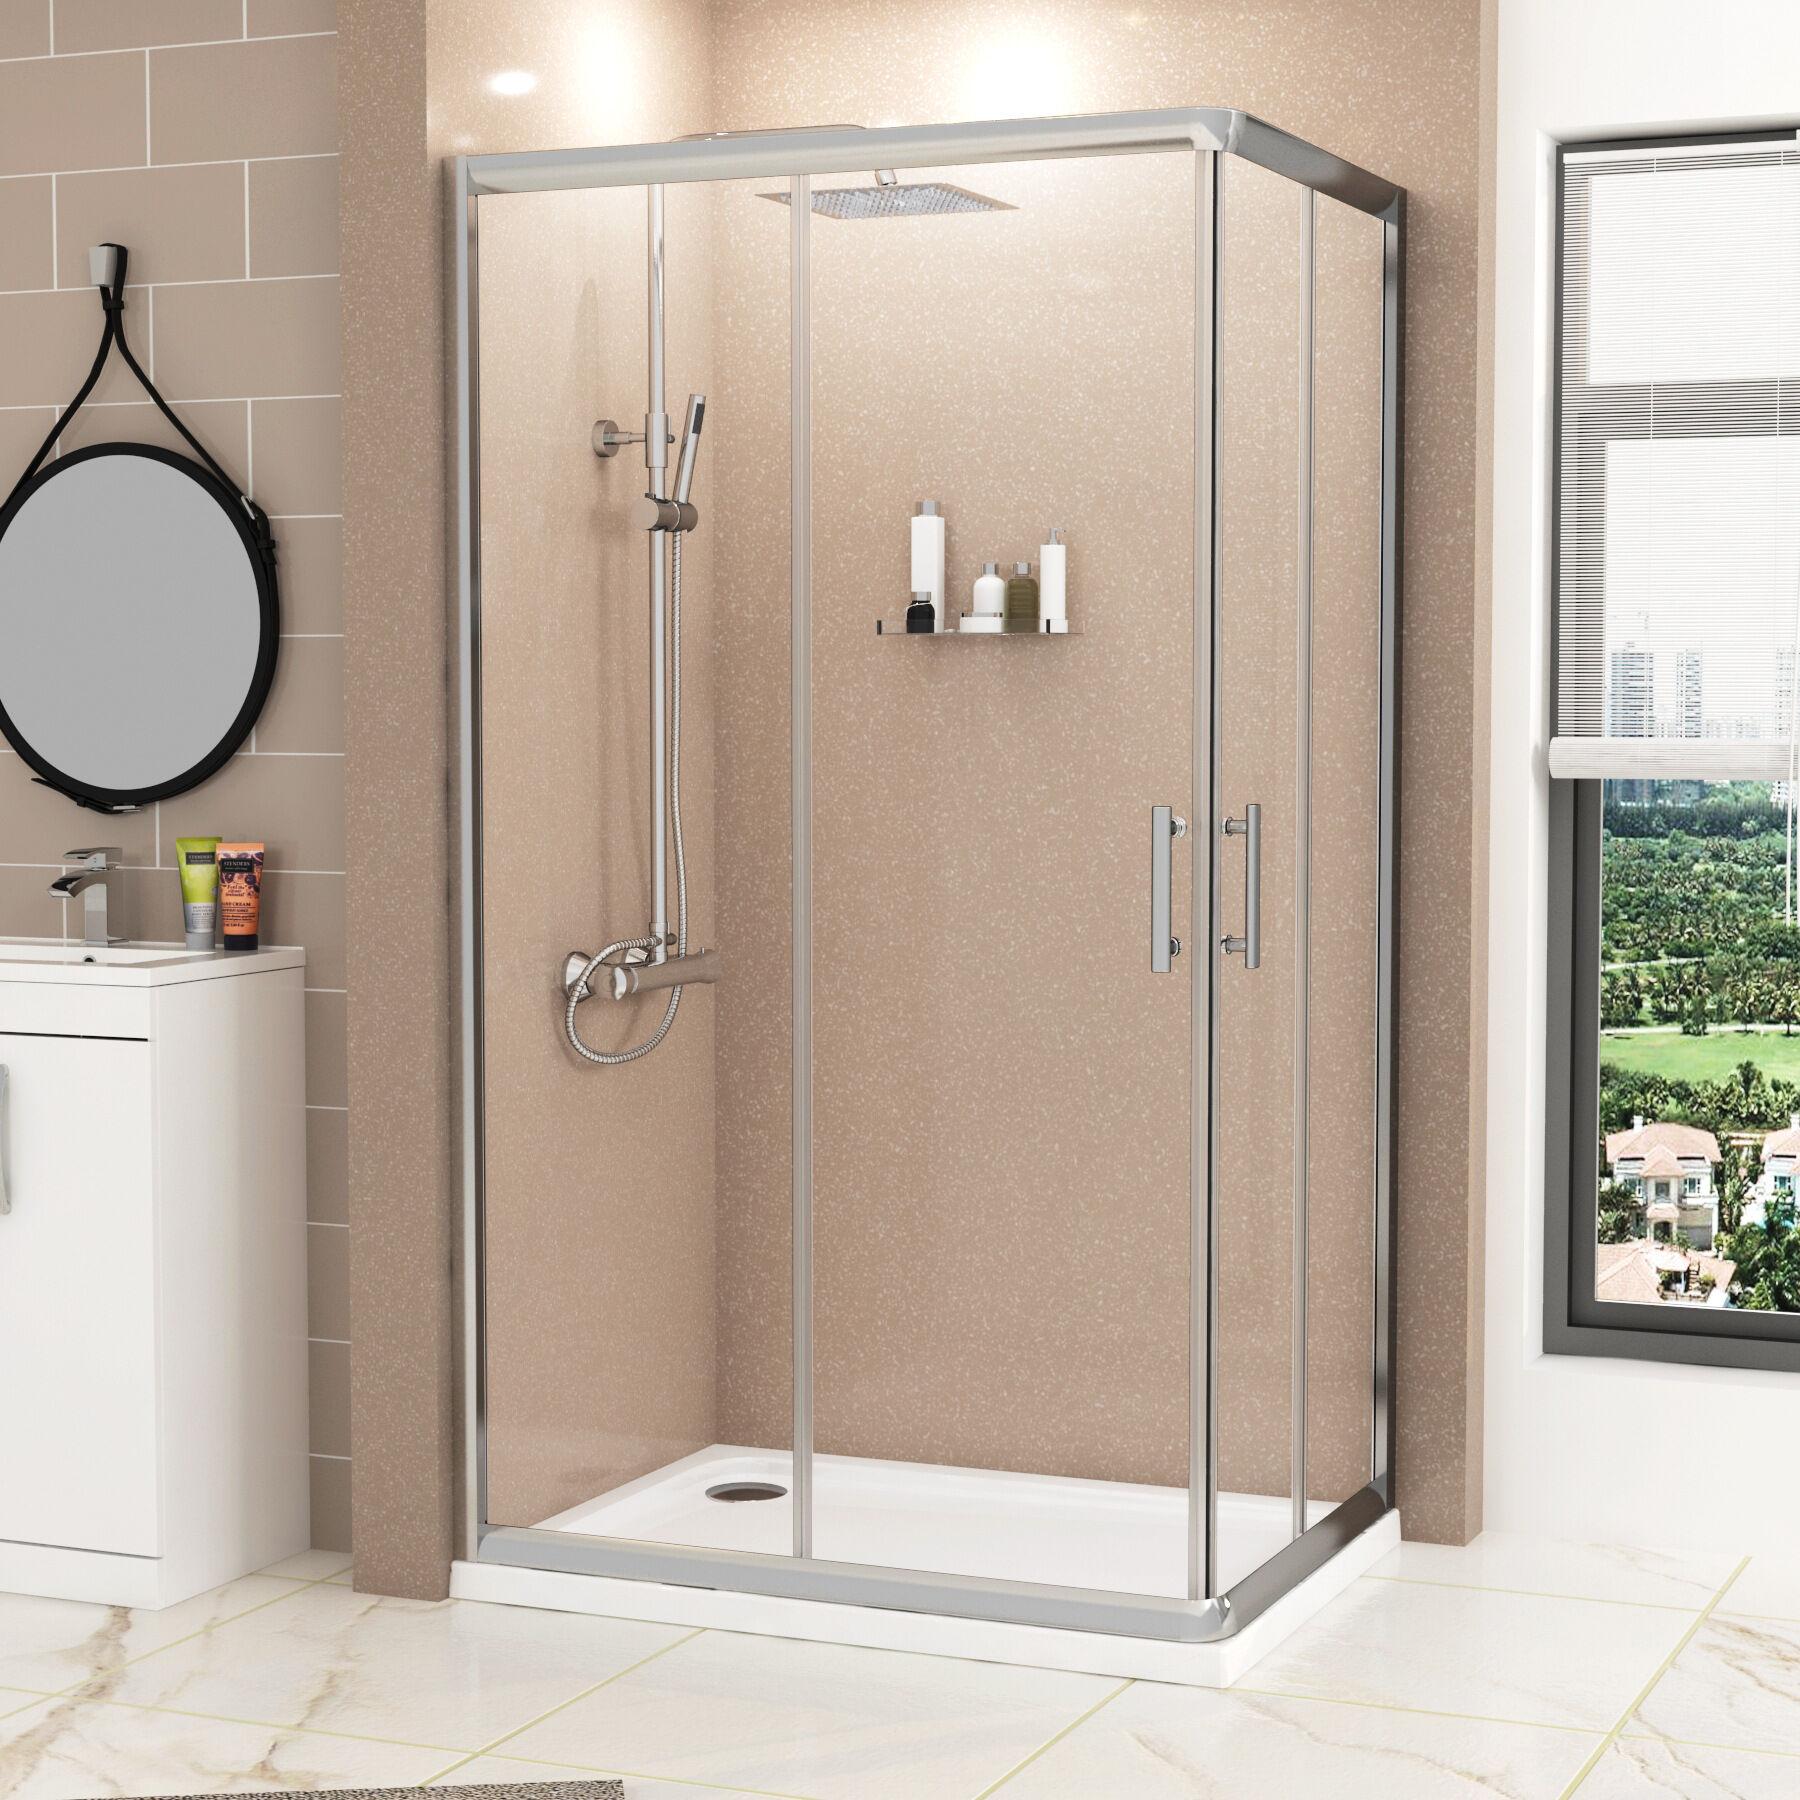 Royal Bathrooms Plaza 1000 x 760mm Rectangular Corner Entry Shower Enclosure - Sliding Door